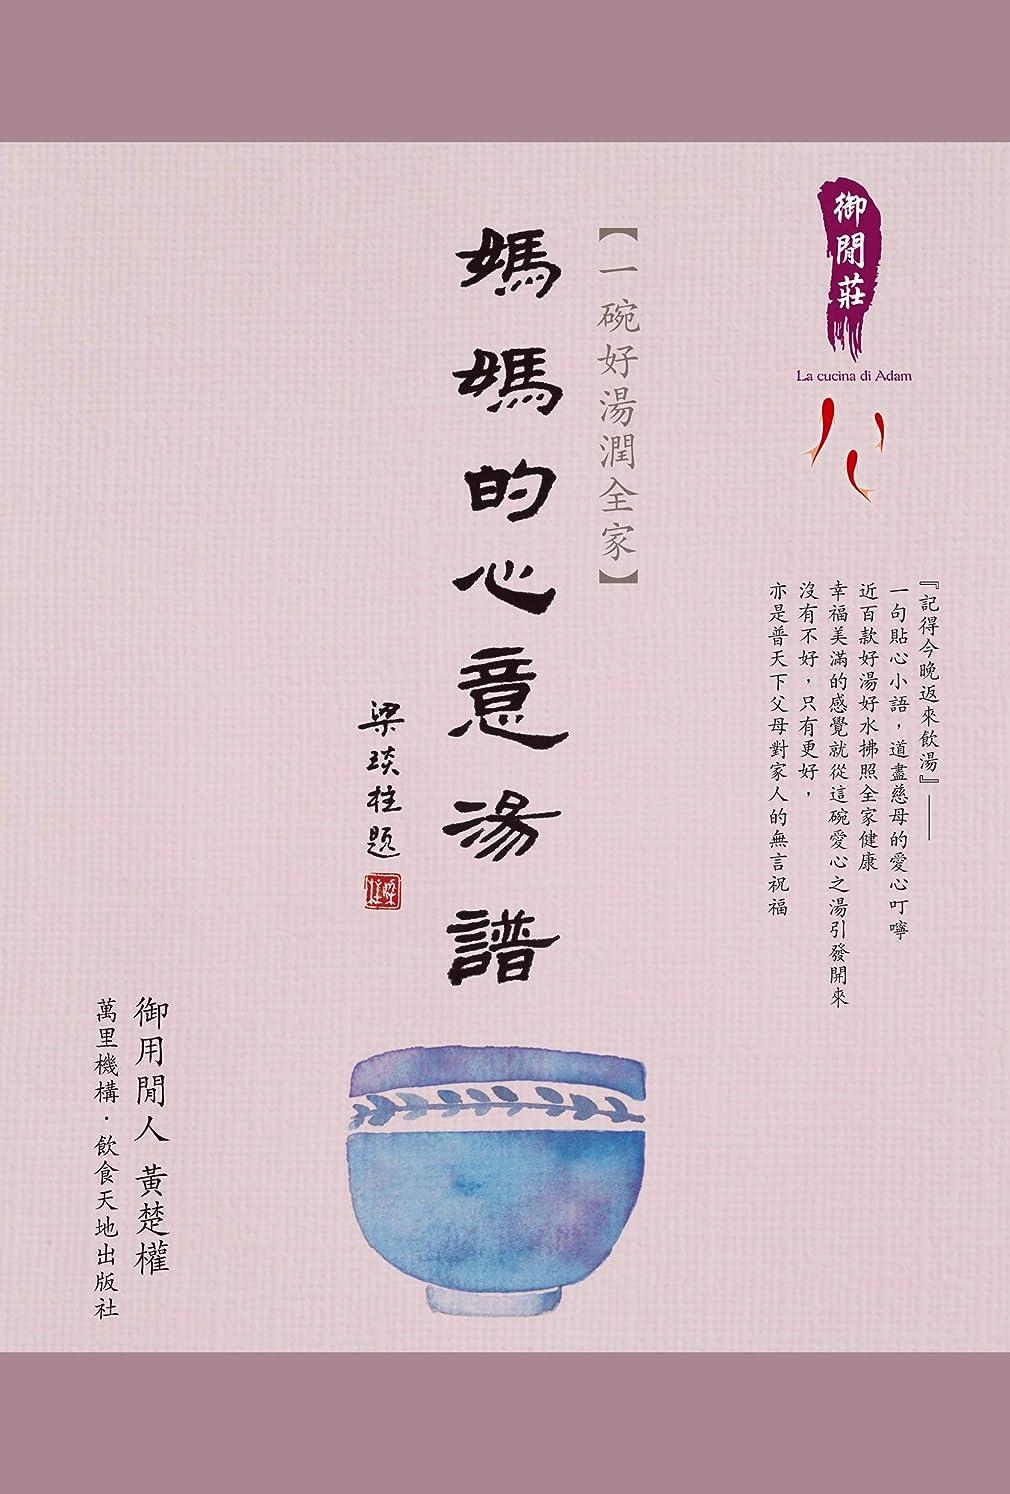 一碗好湯潤全家--媽媽的心意湯譜 (Traditional Chinese Edition)